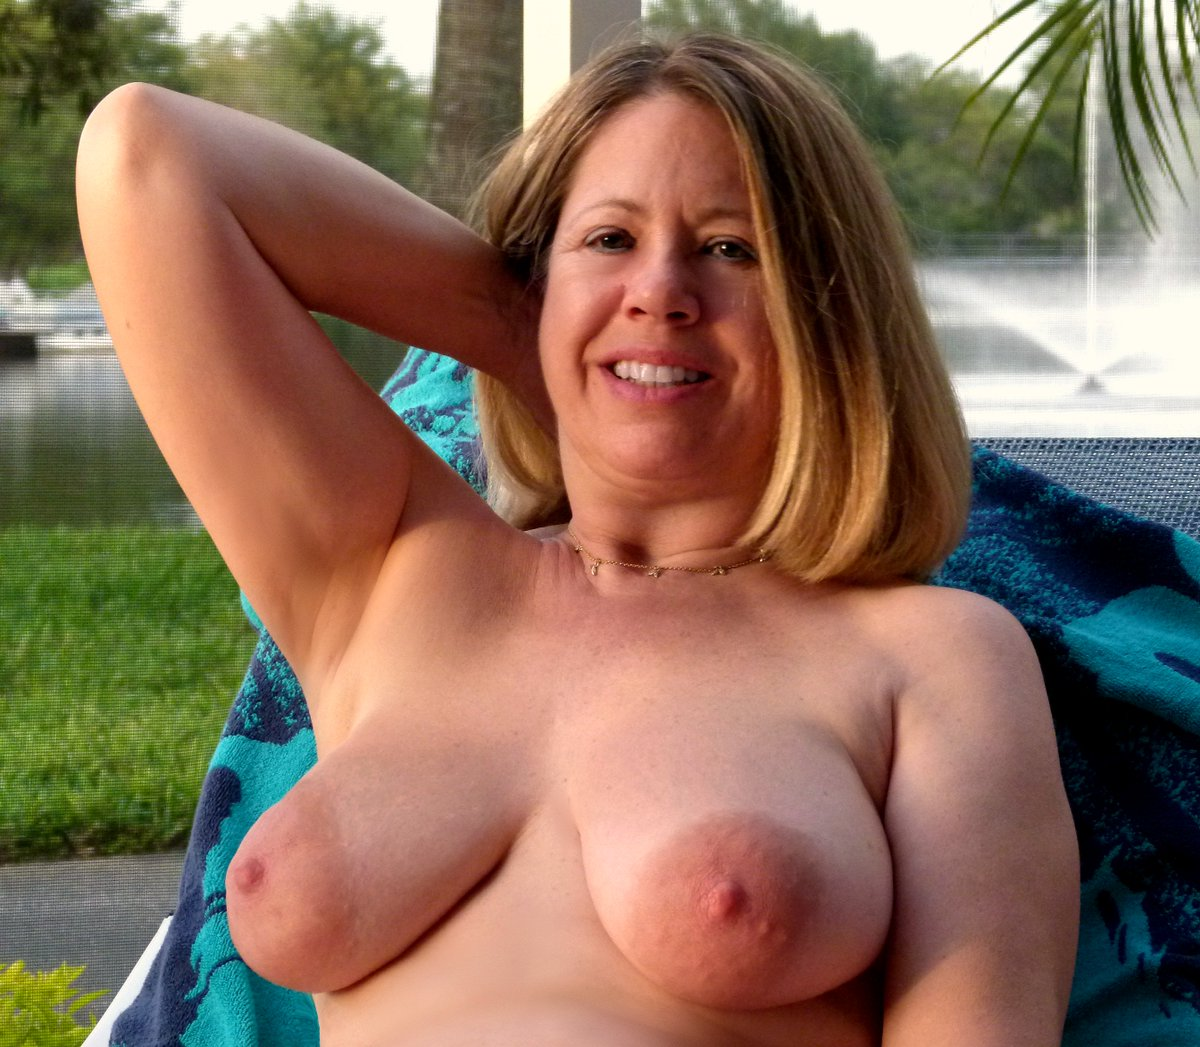 nude Mary clare nudist resort